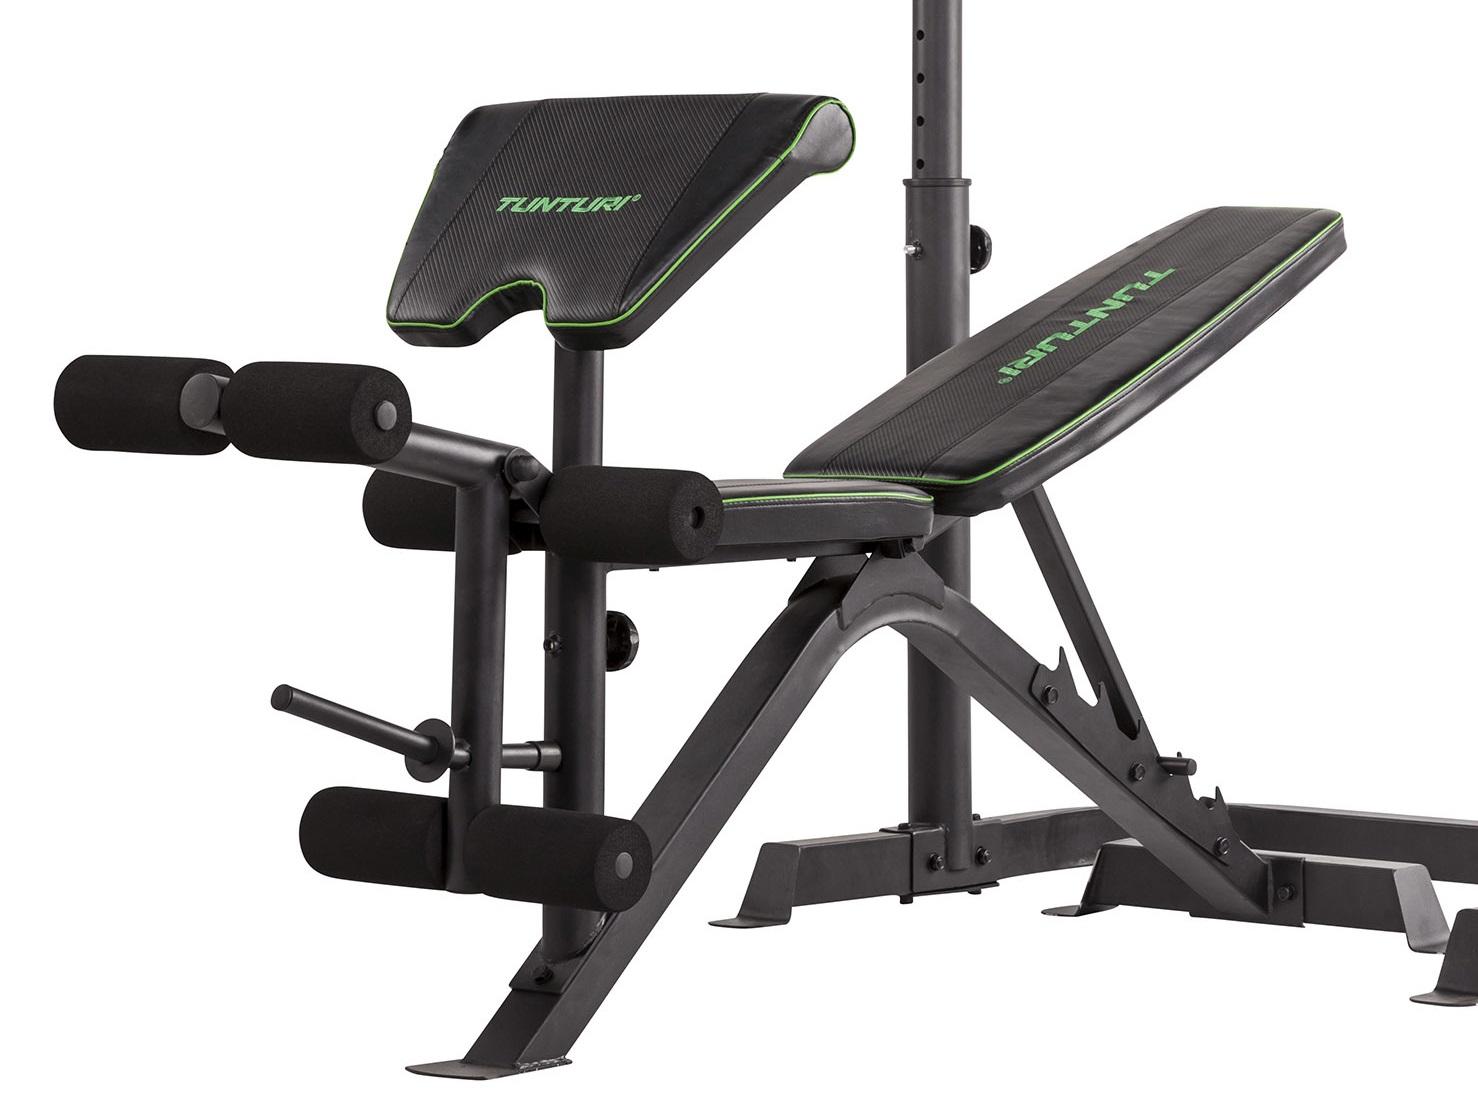 TUNTURI WB50 Mid Width Weight Bench lavice